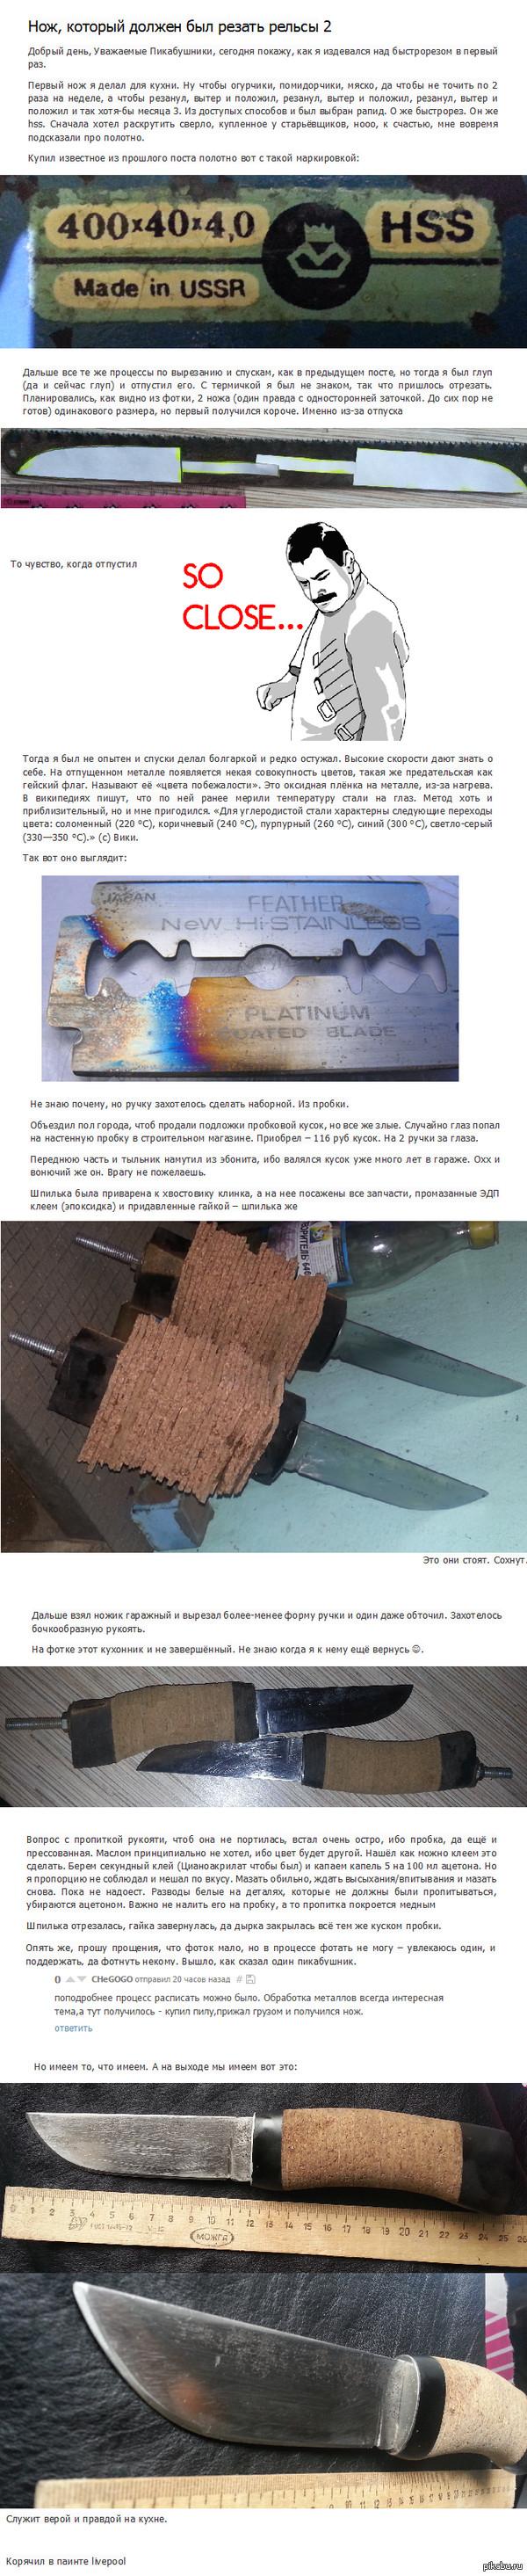 "Нож, который должен был резать рельсы. v. 0.1 или кухонник, который долго живёт. предыдущий пост <a href=""http://pikabu.ru/story/nozh_kotoryiy_dolzhen_byil_rezat_relsyi_3543347"">http://pikabu.ru/story/_3543347</a>"